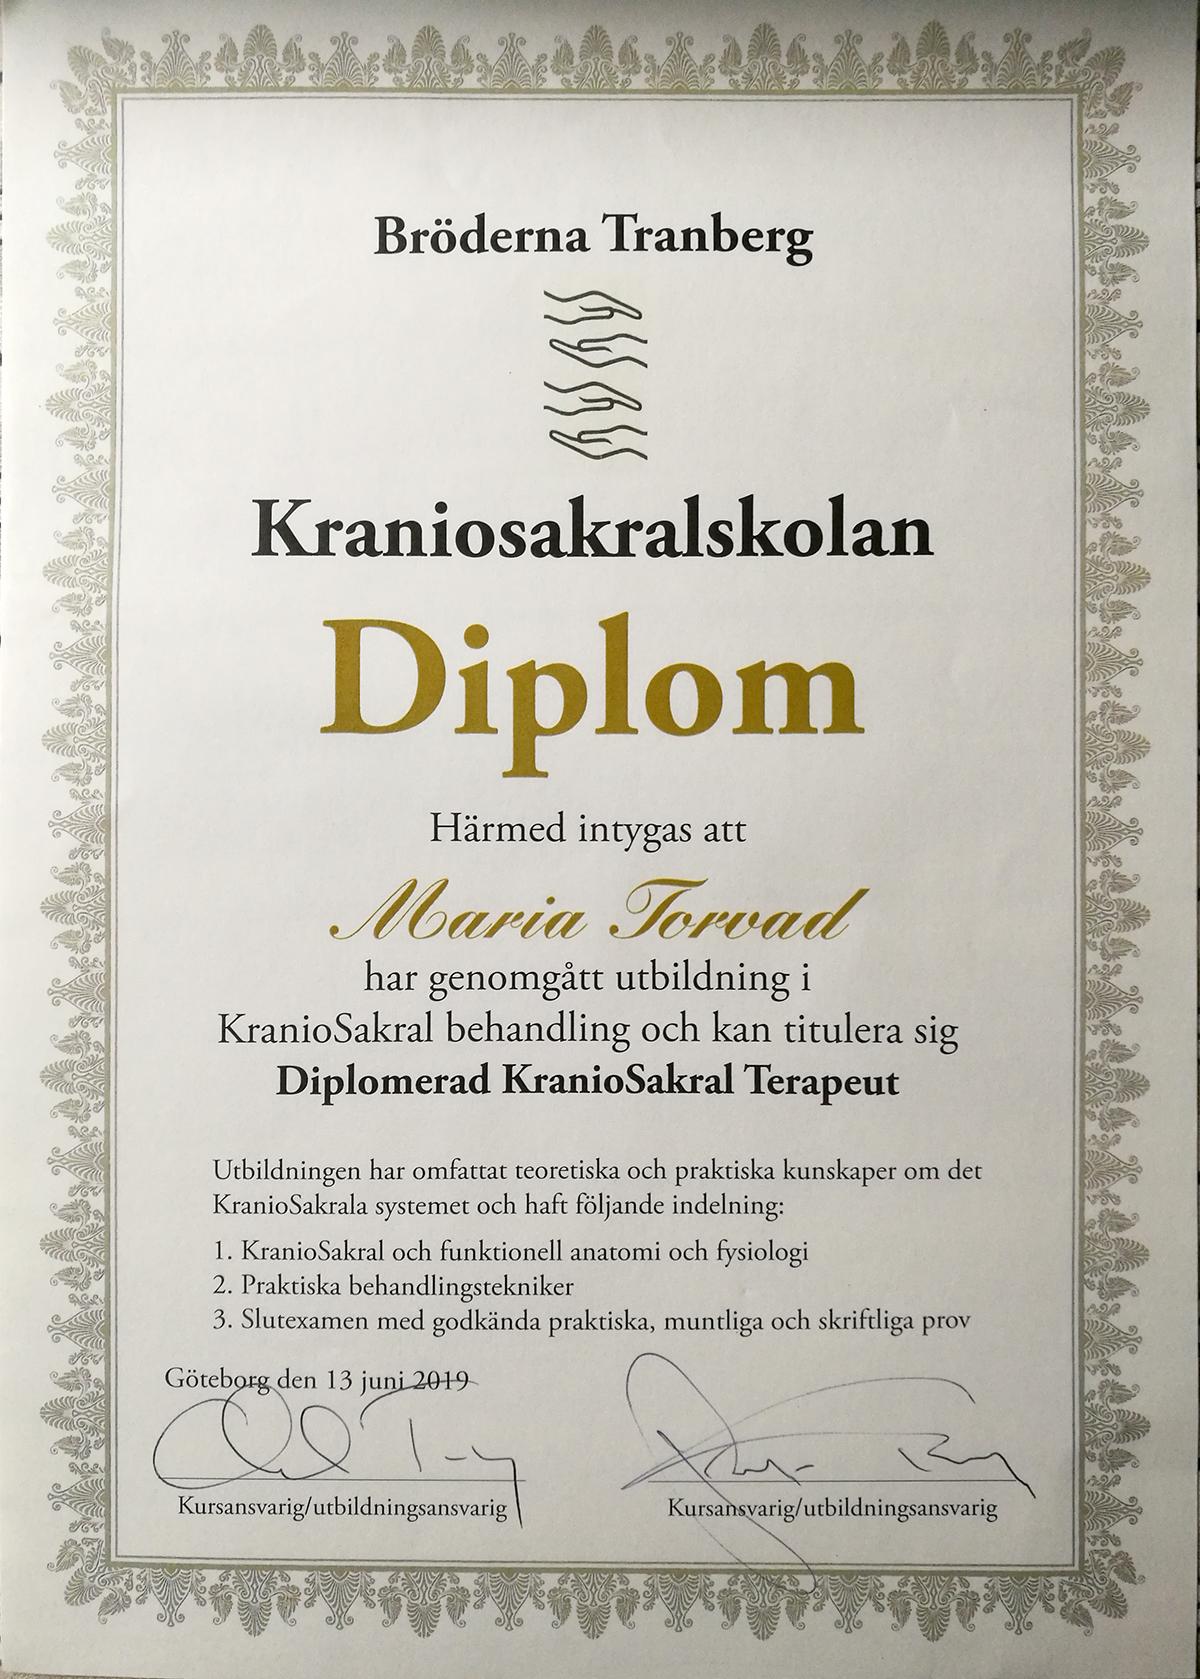 Foto på certifikat; Diplomerad KranioSakral Terapeut.